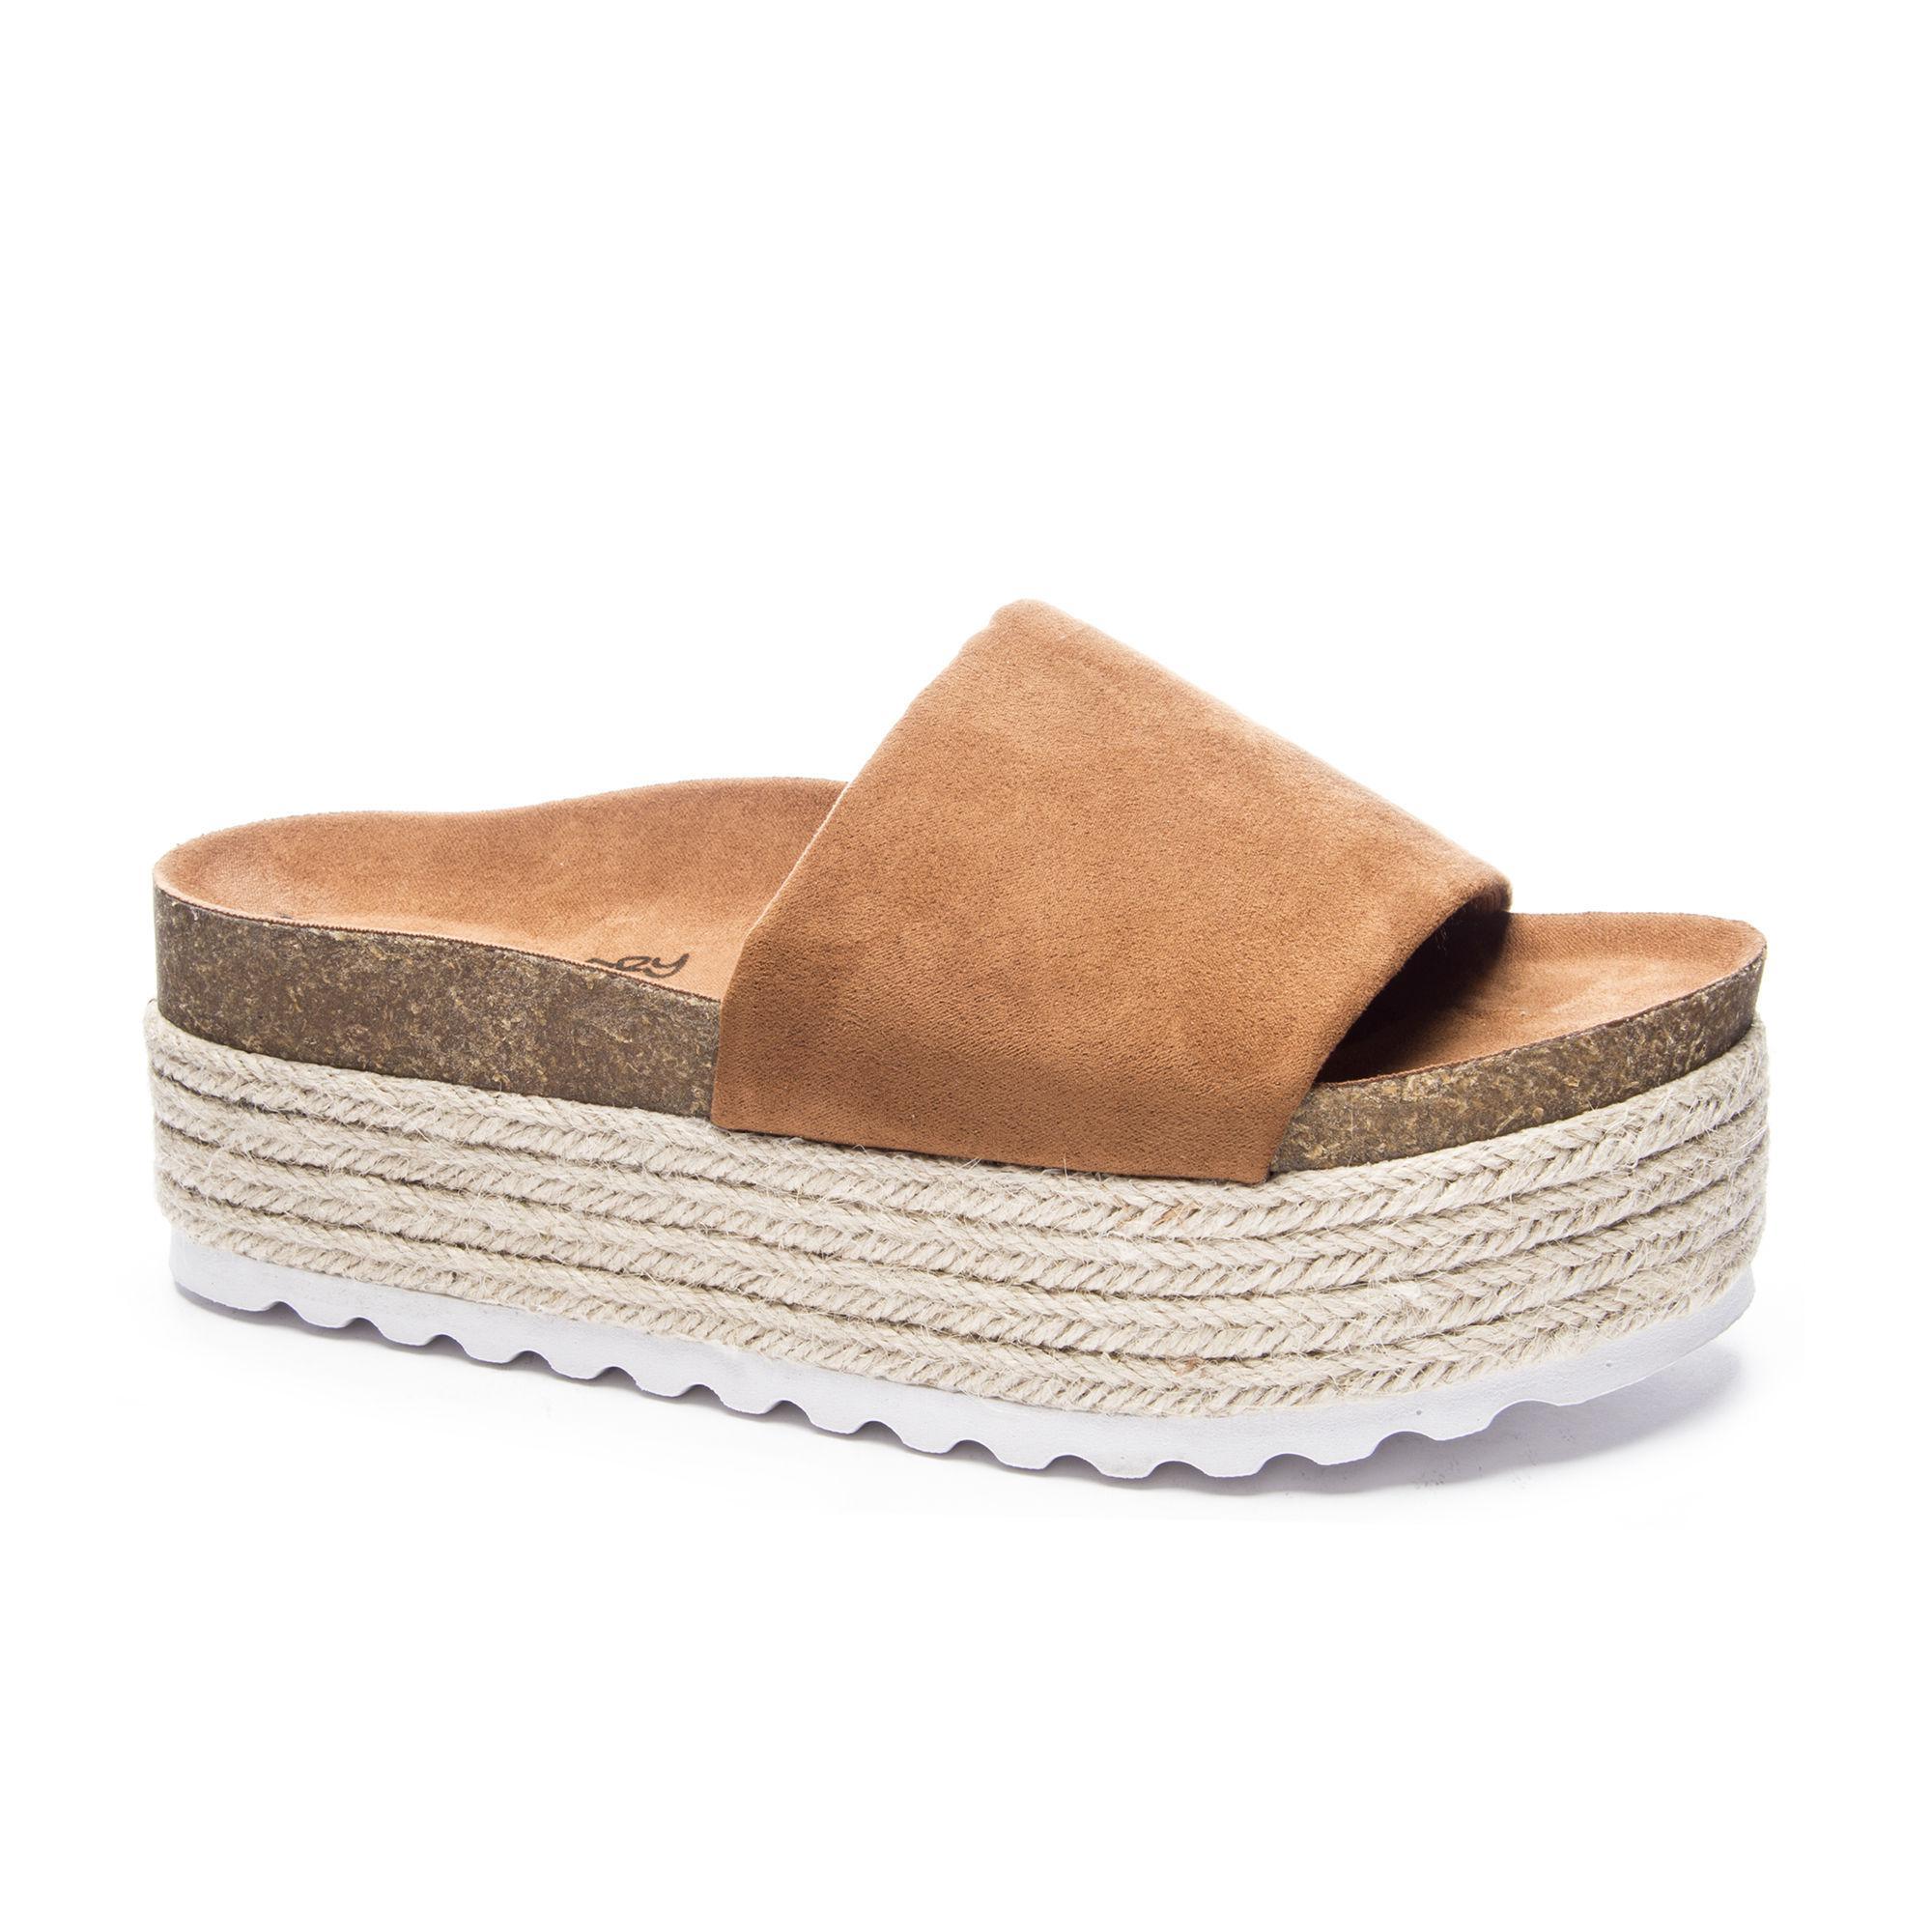 3fd9623bf0f9 Dirty Laundry. Women s Pippa Slide Sandal